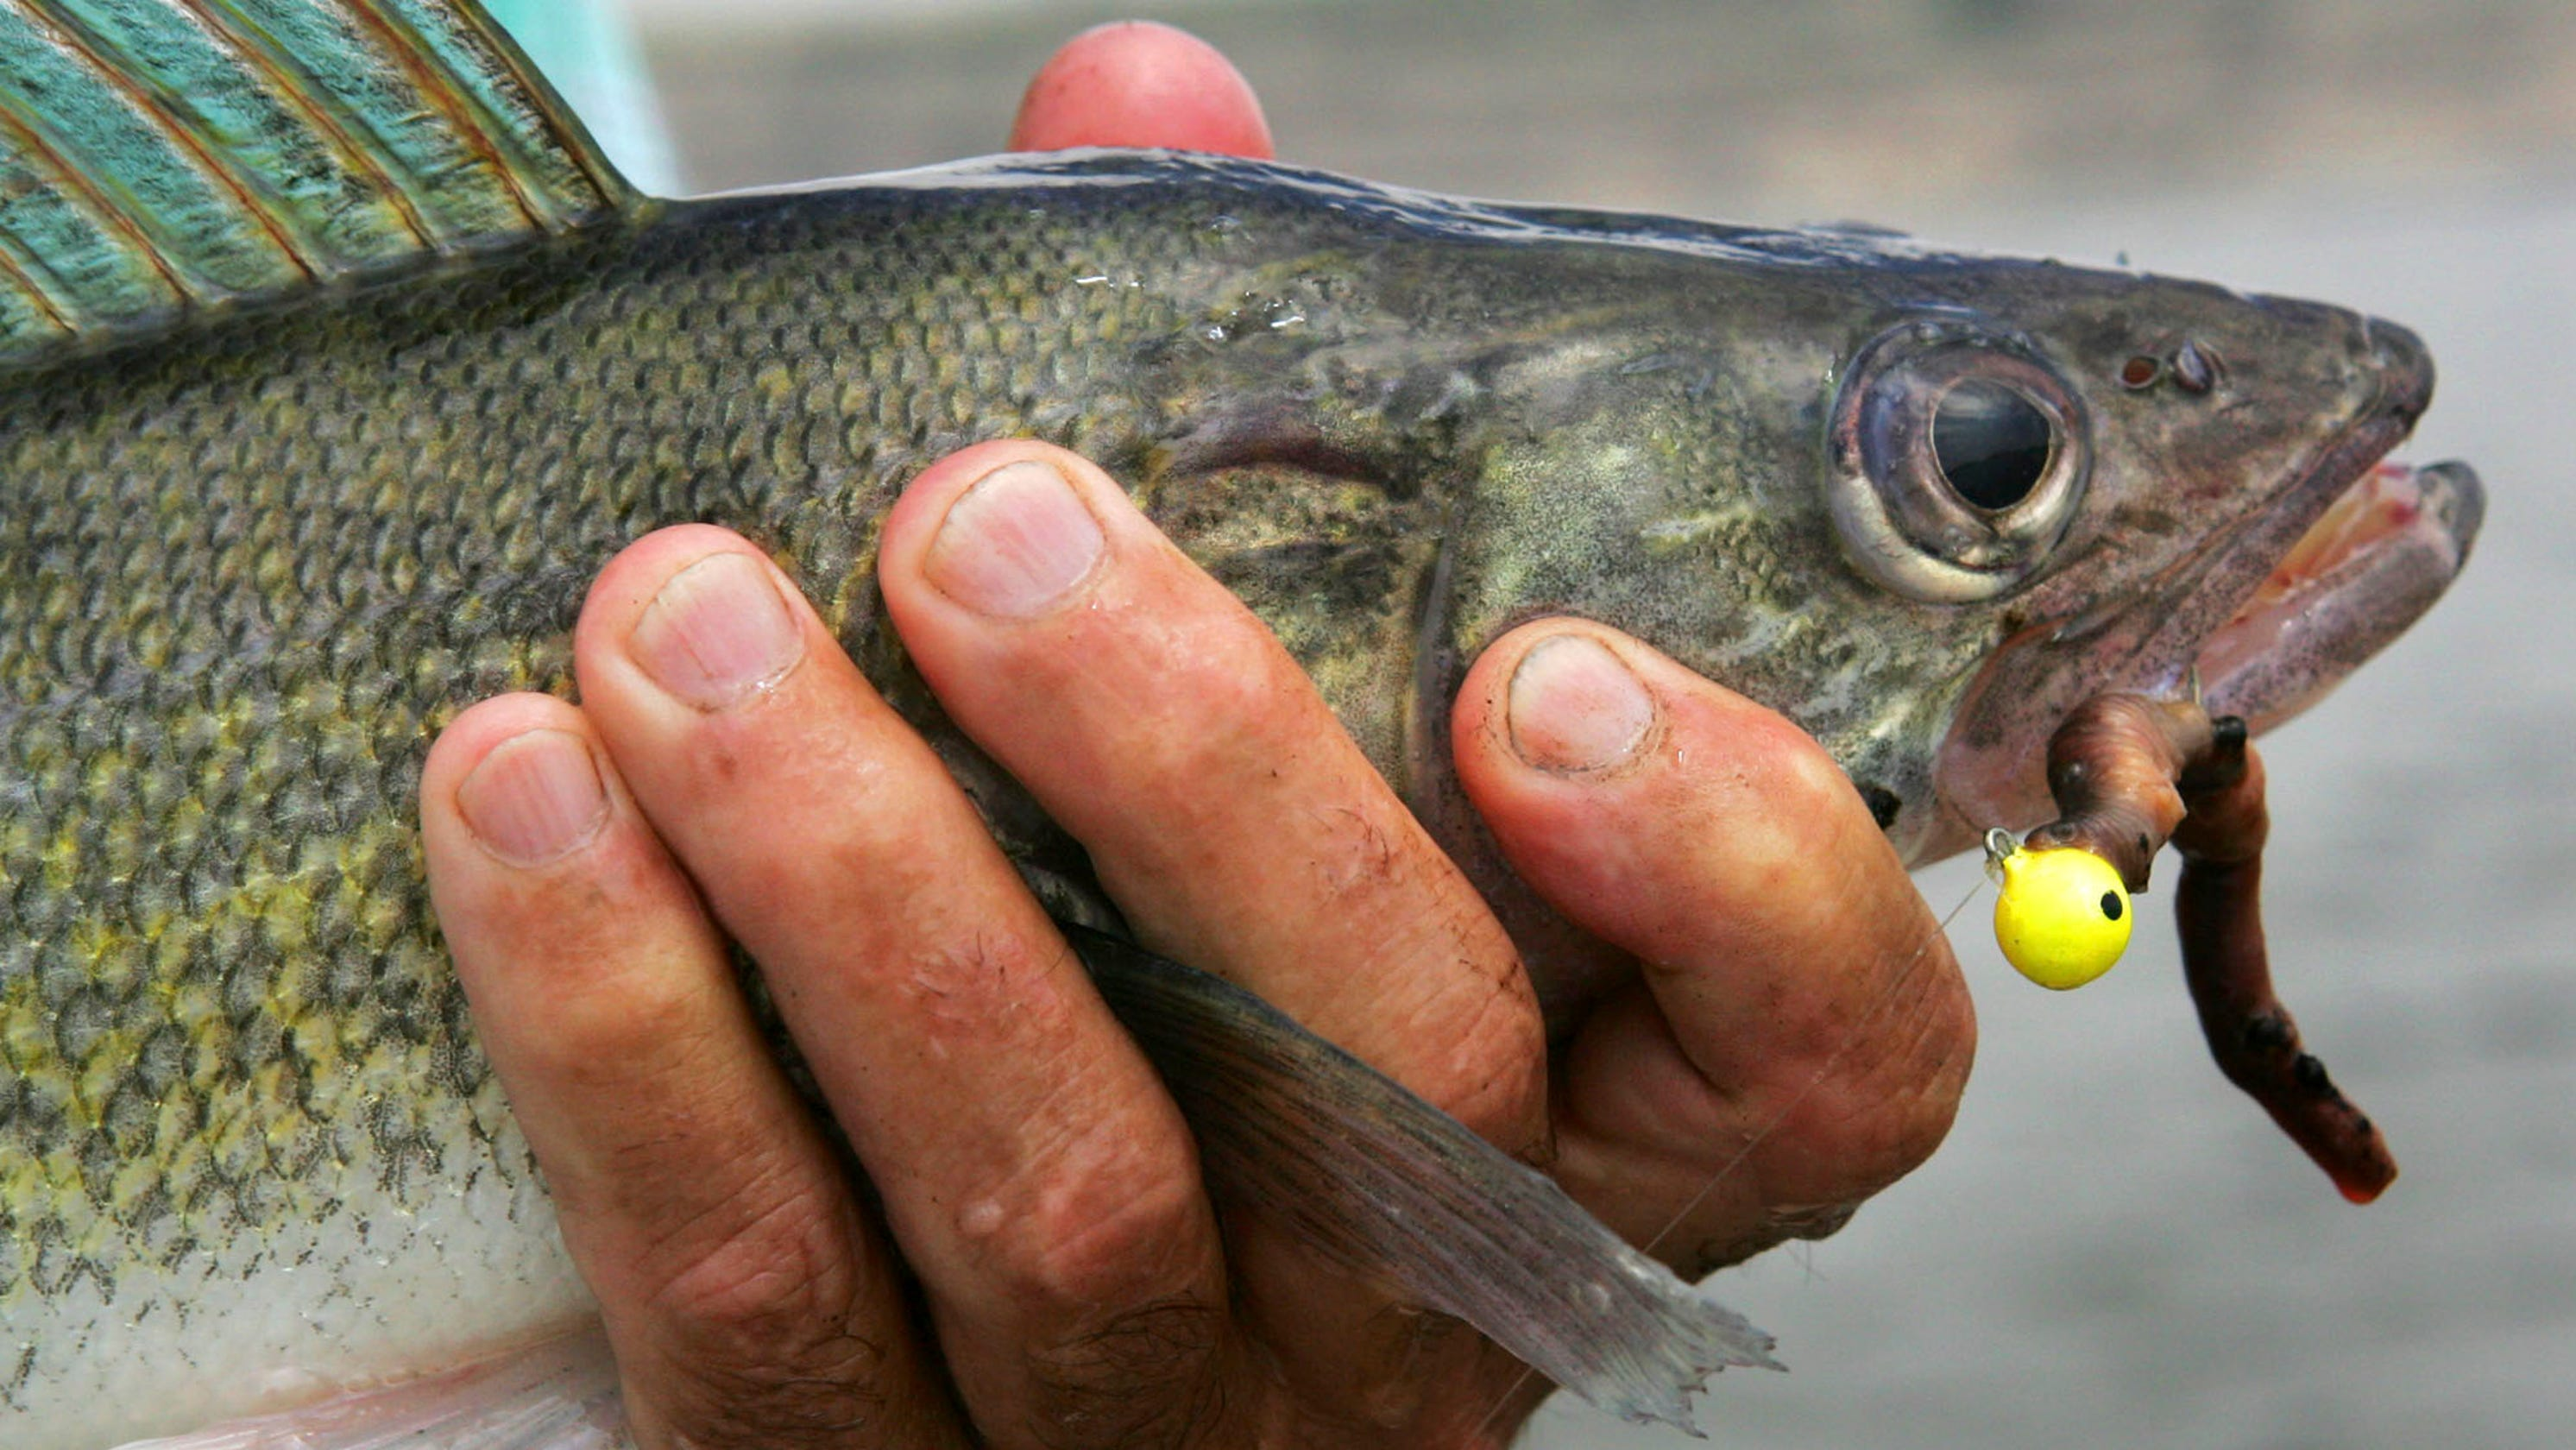 Global warming is killing fish, hurting sport fishing industry